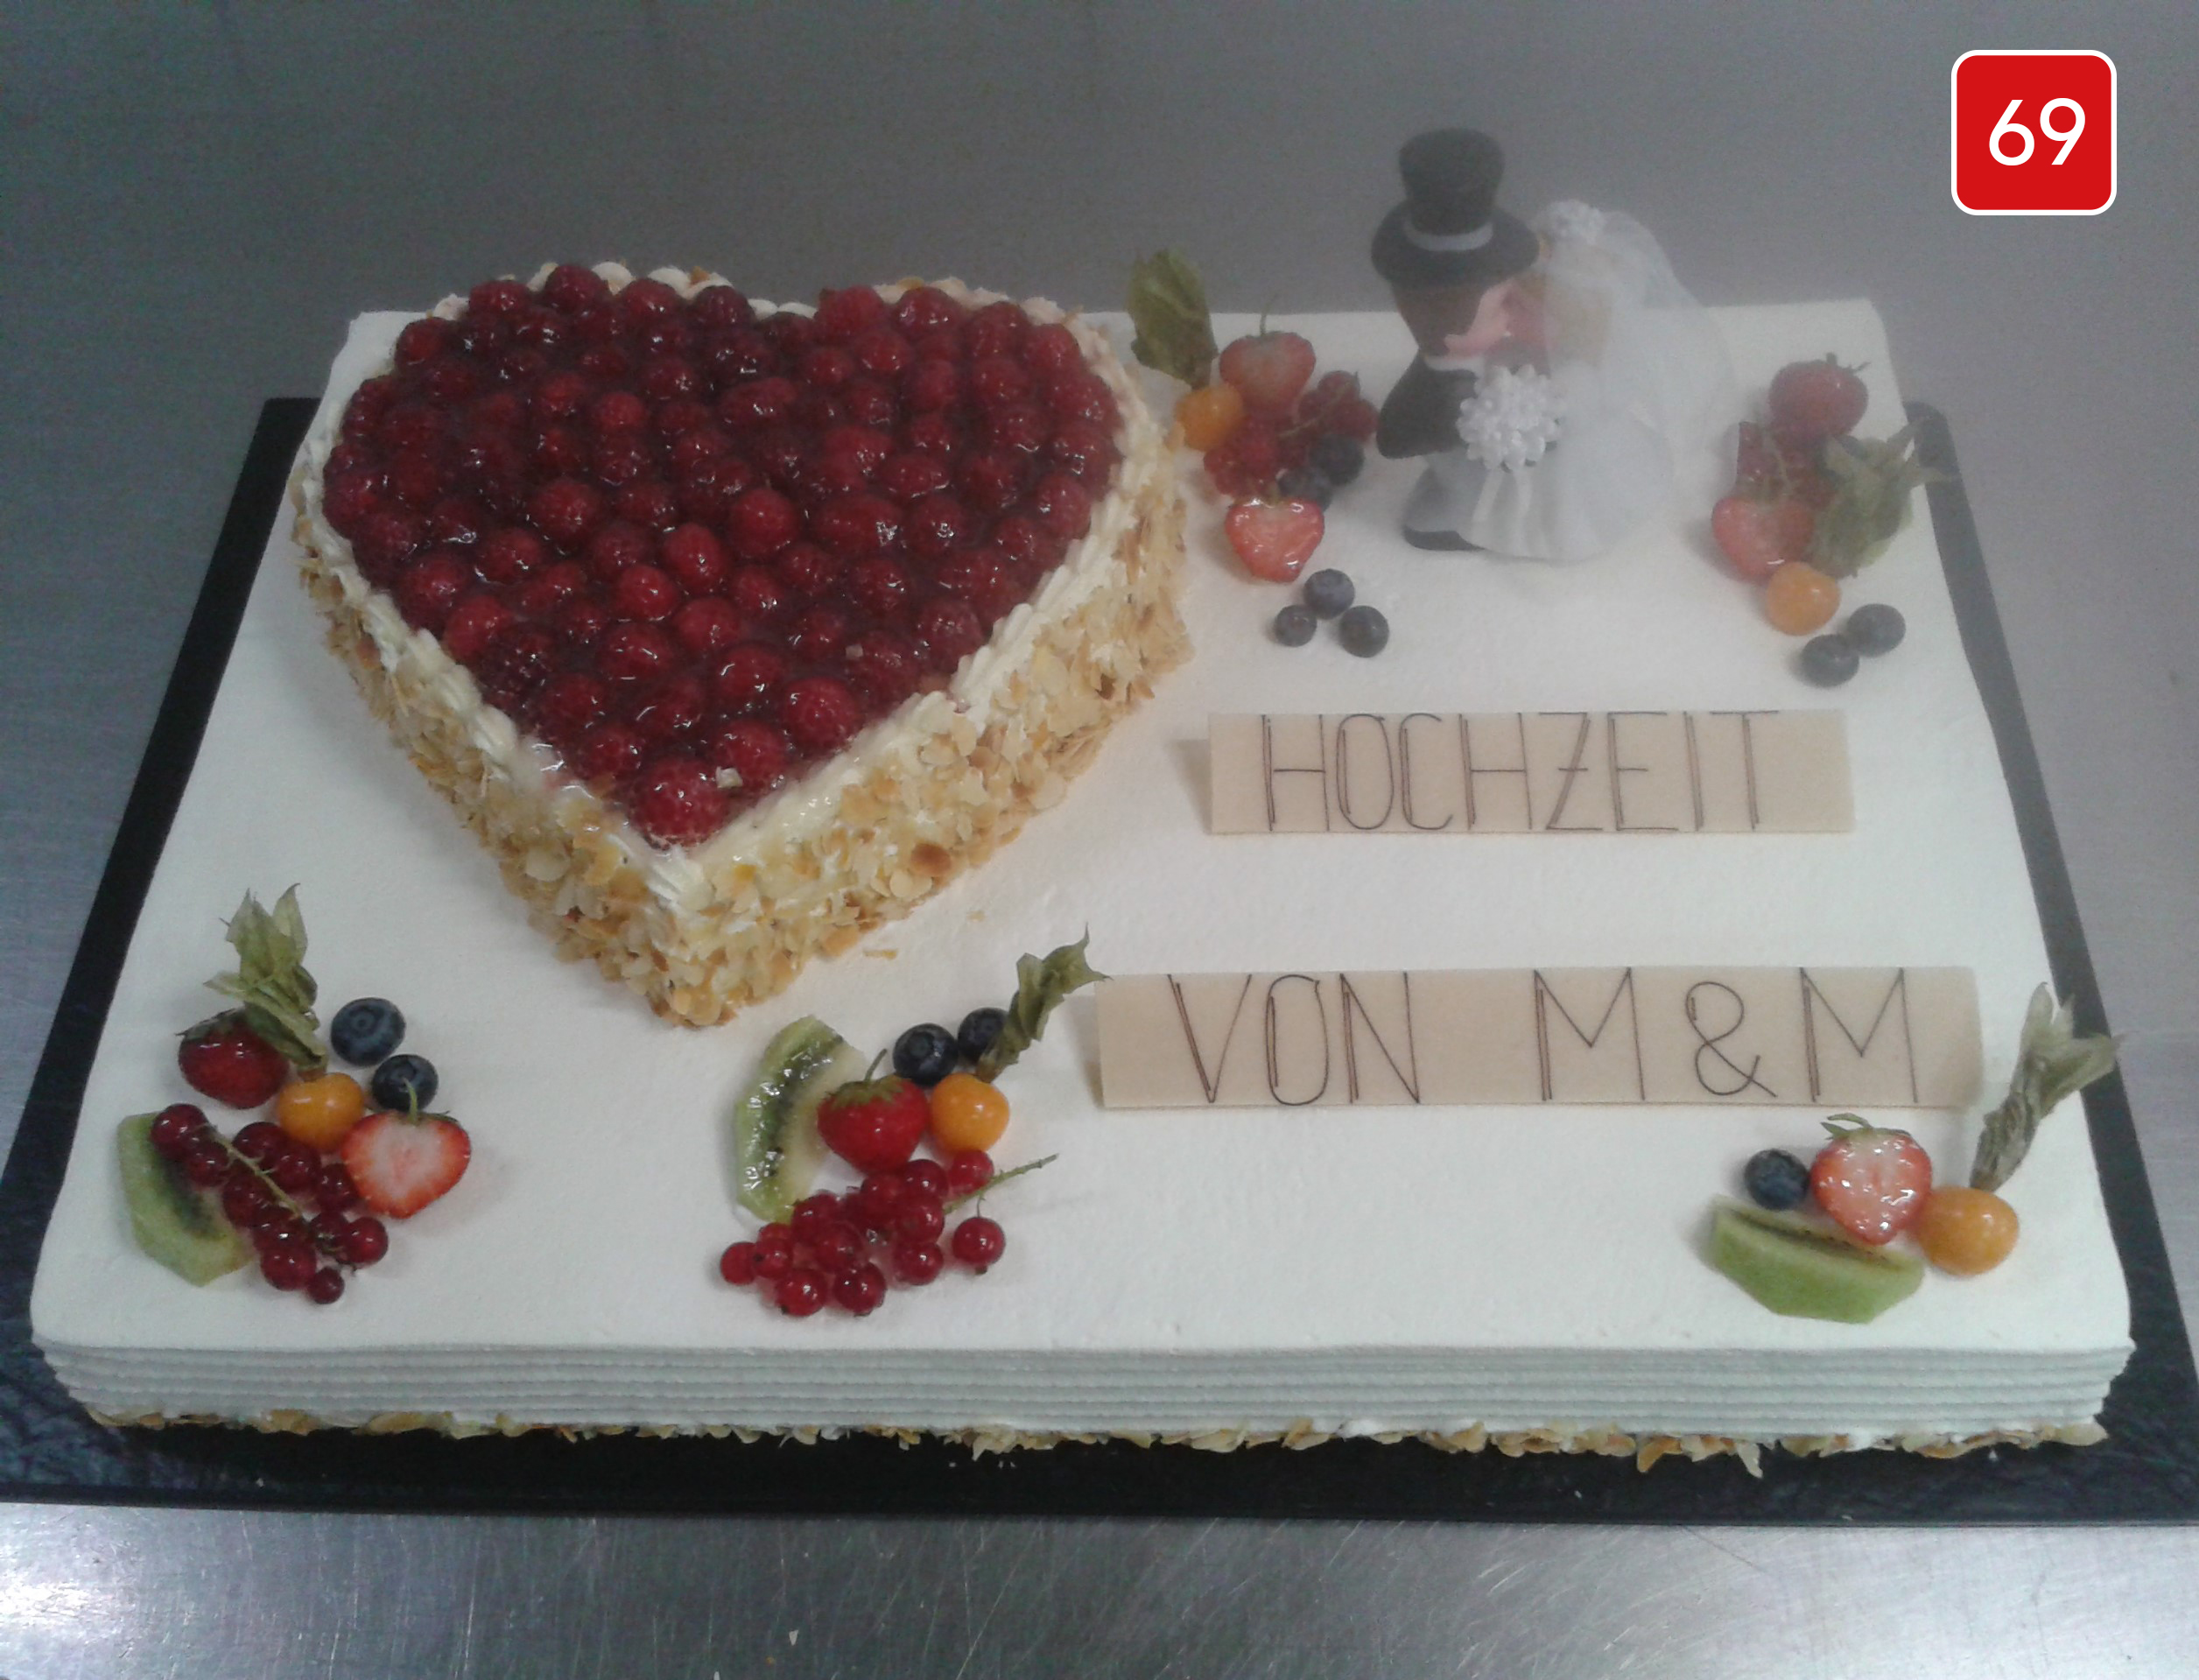 Torte 69